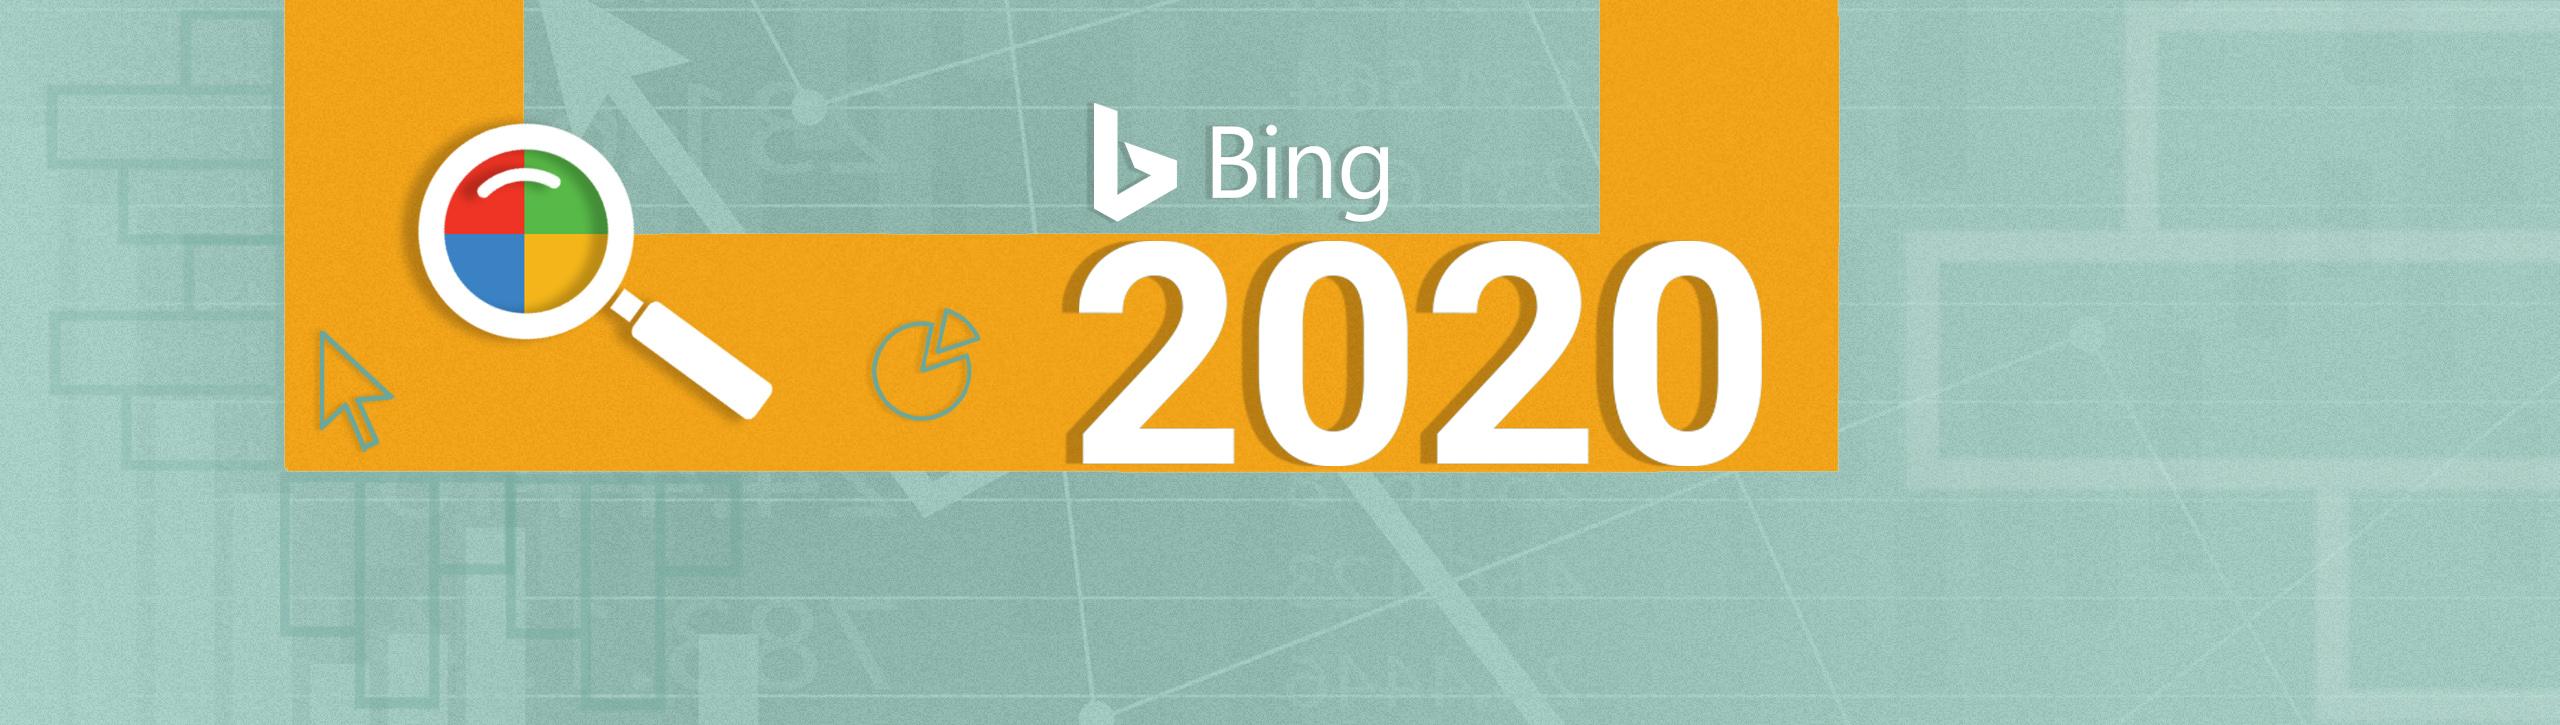 Bing Search Statistics 2020